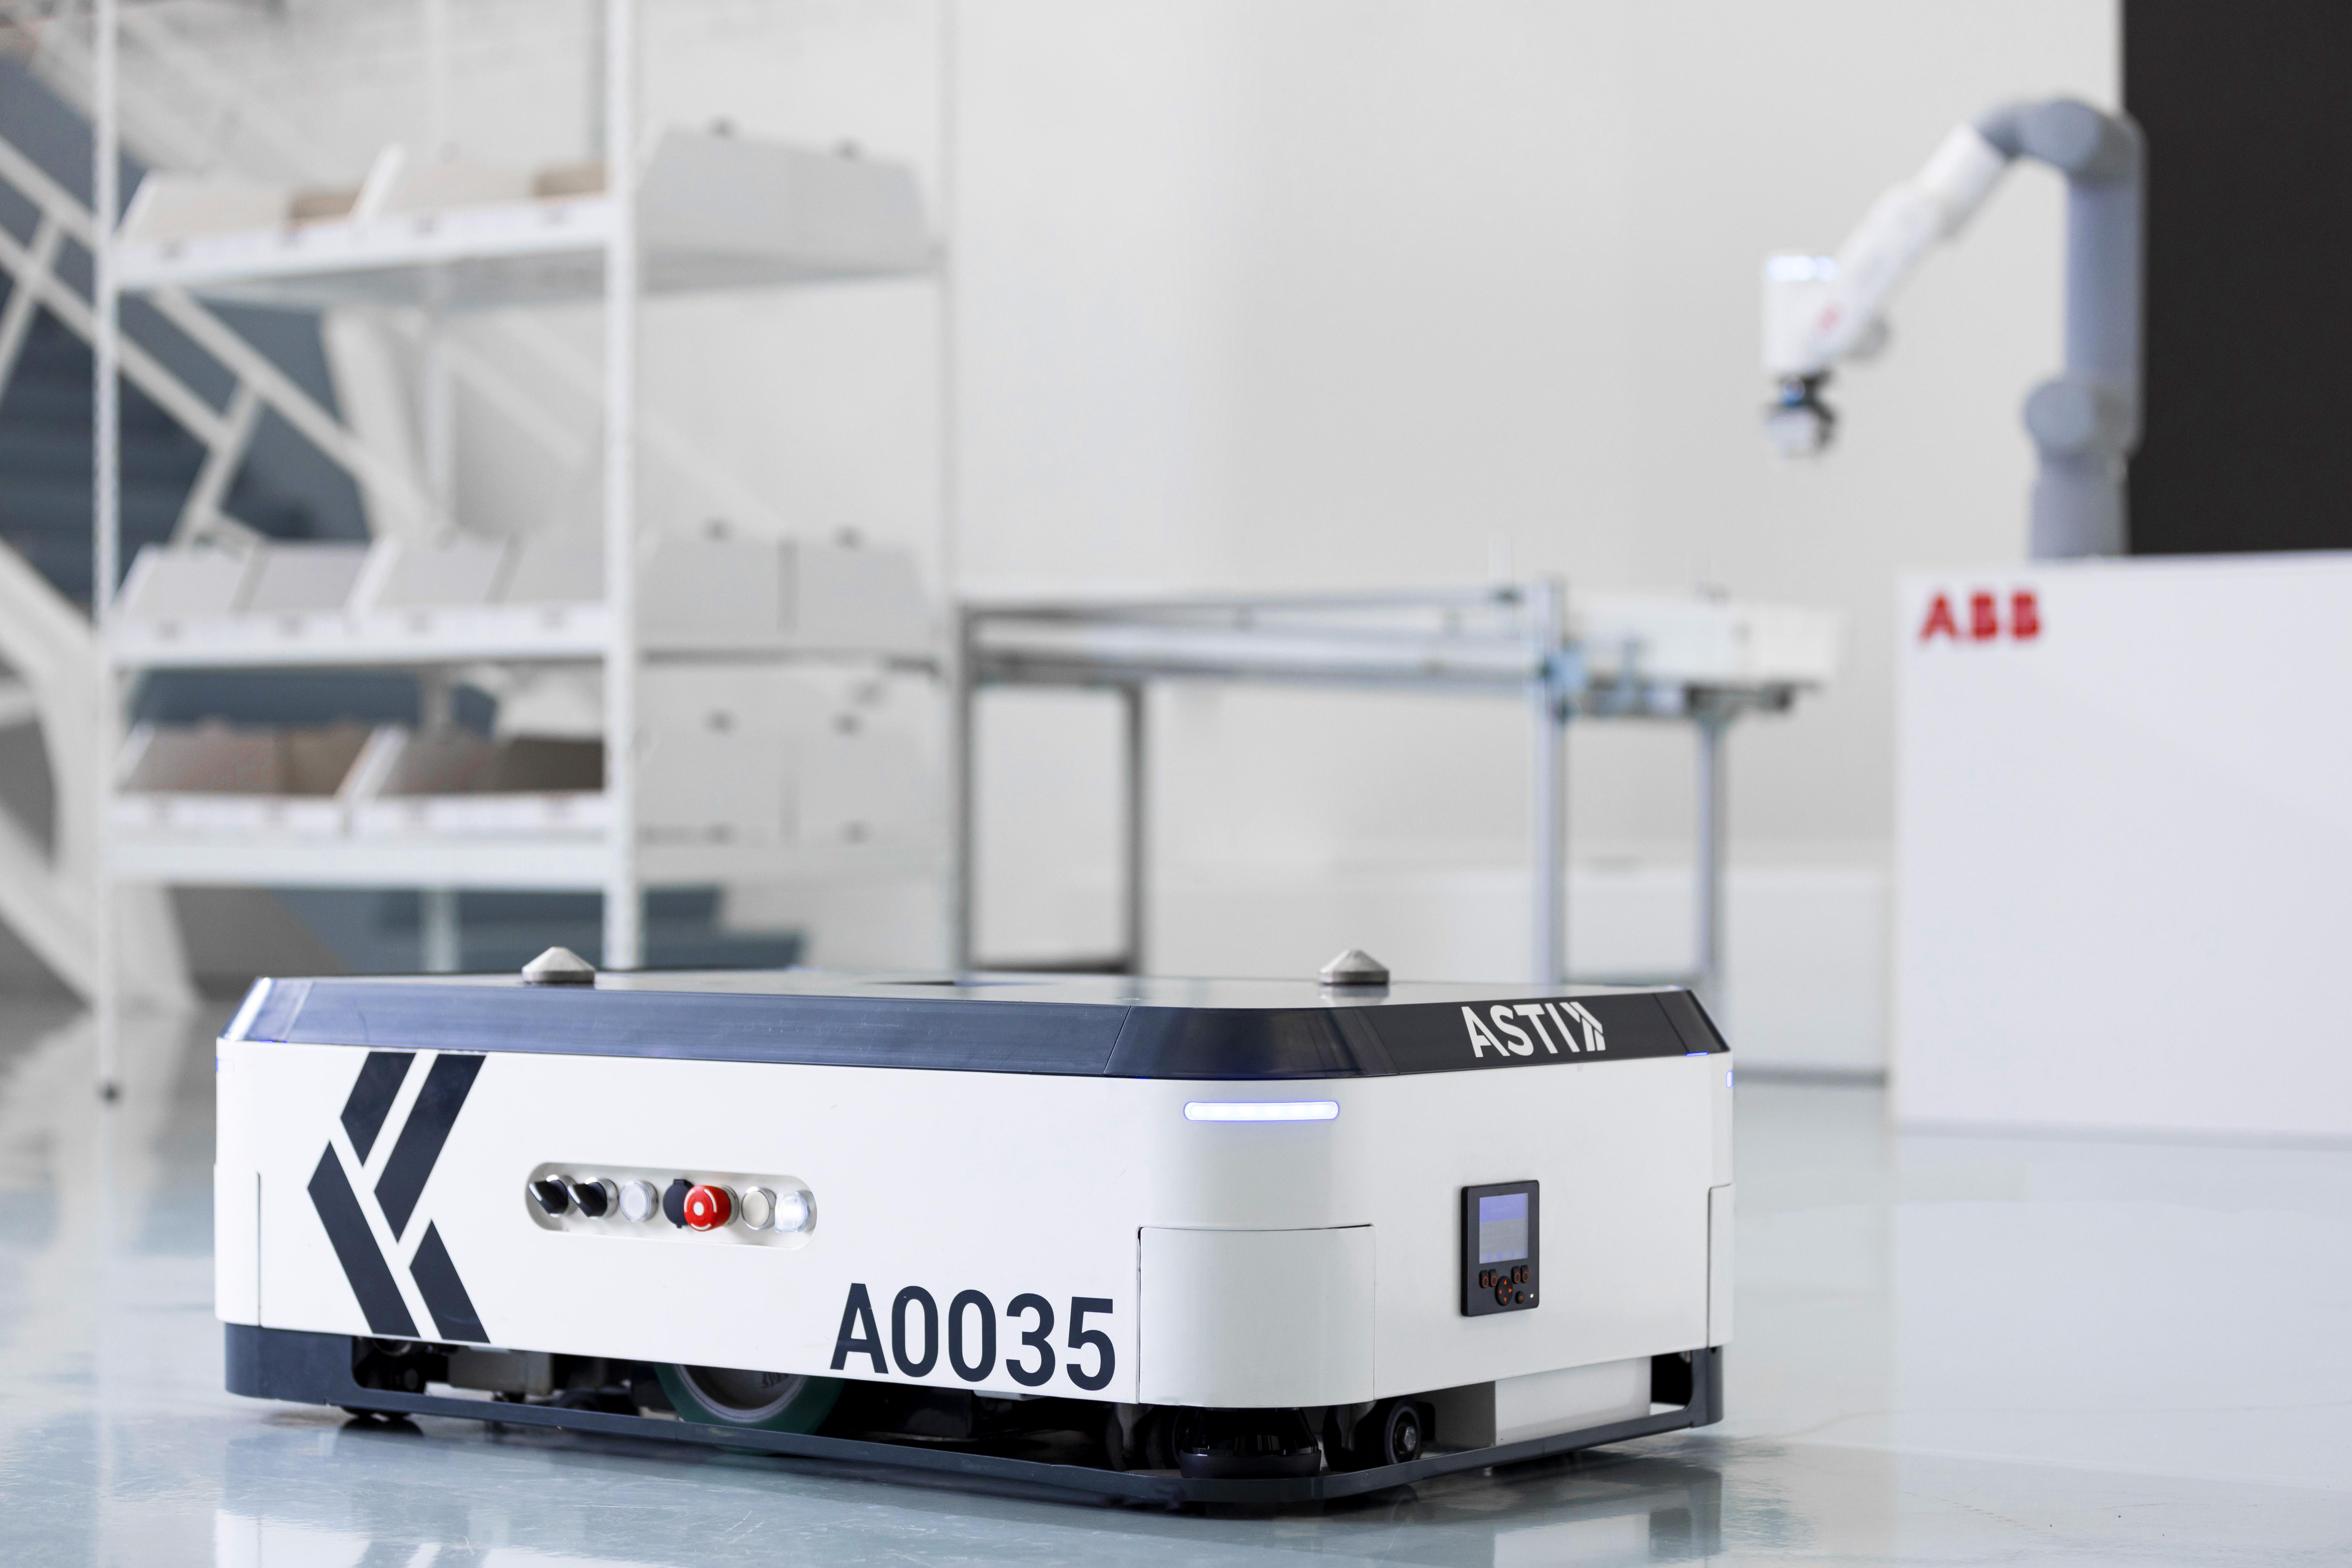 Asti abb robotics acquires asti mobile robotics goods to person gofa cobot asti ebot 350